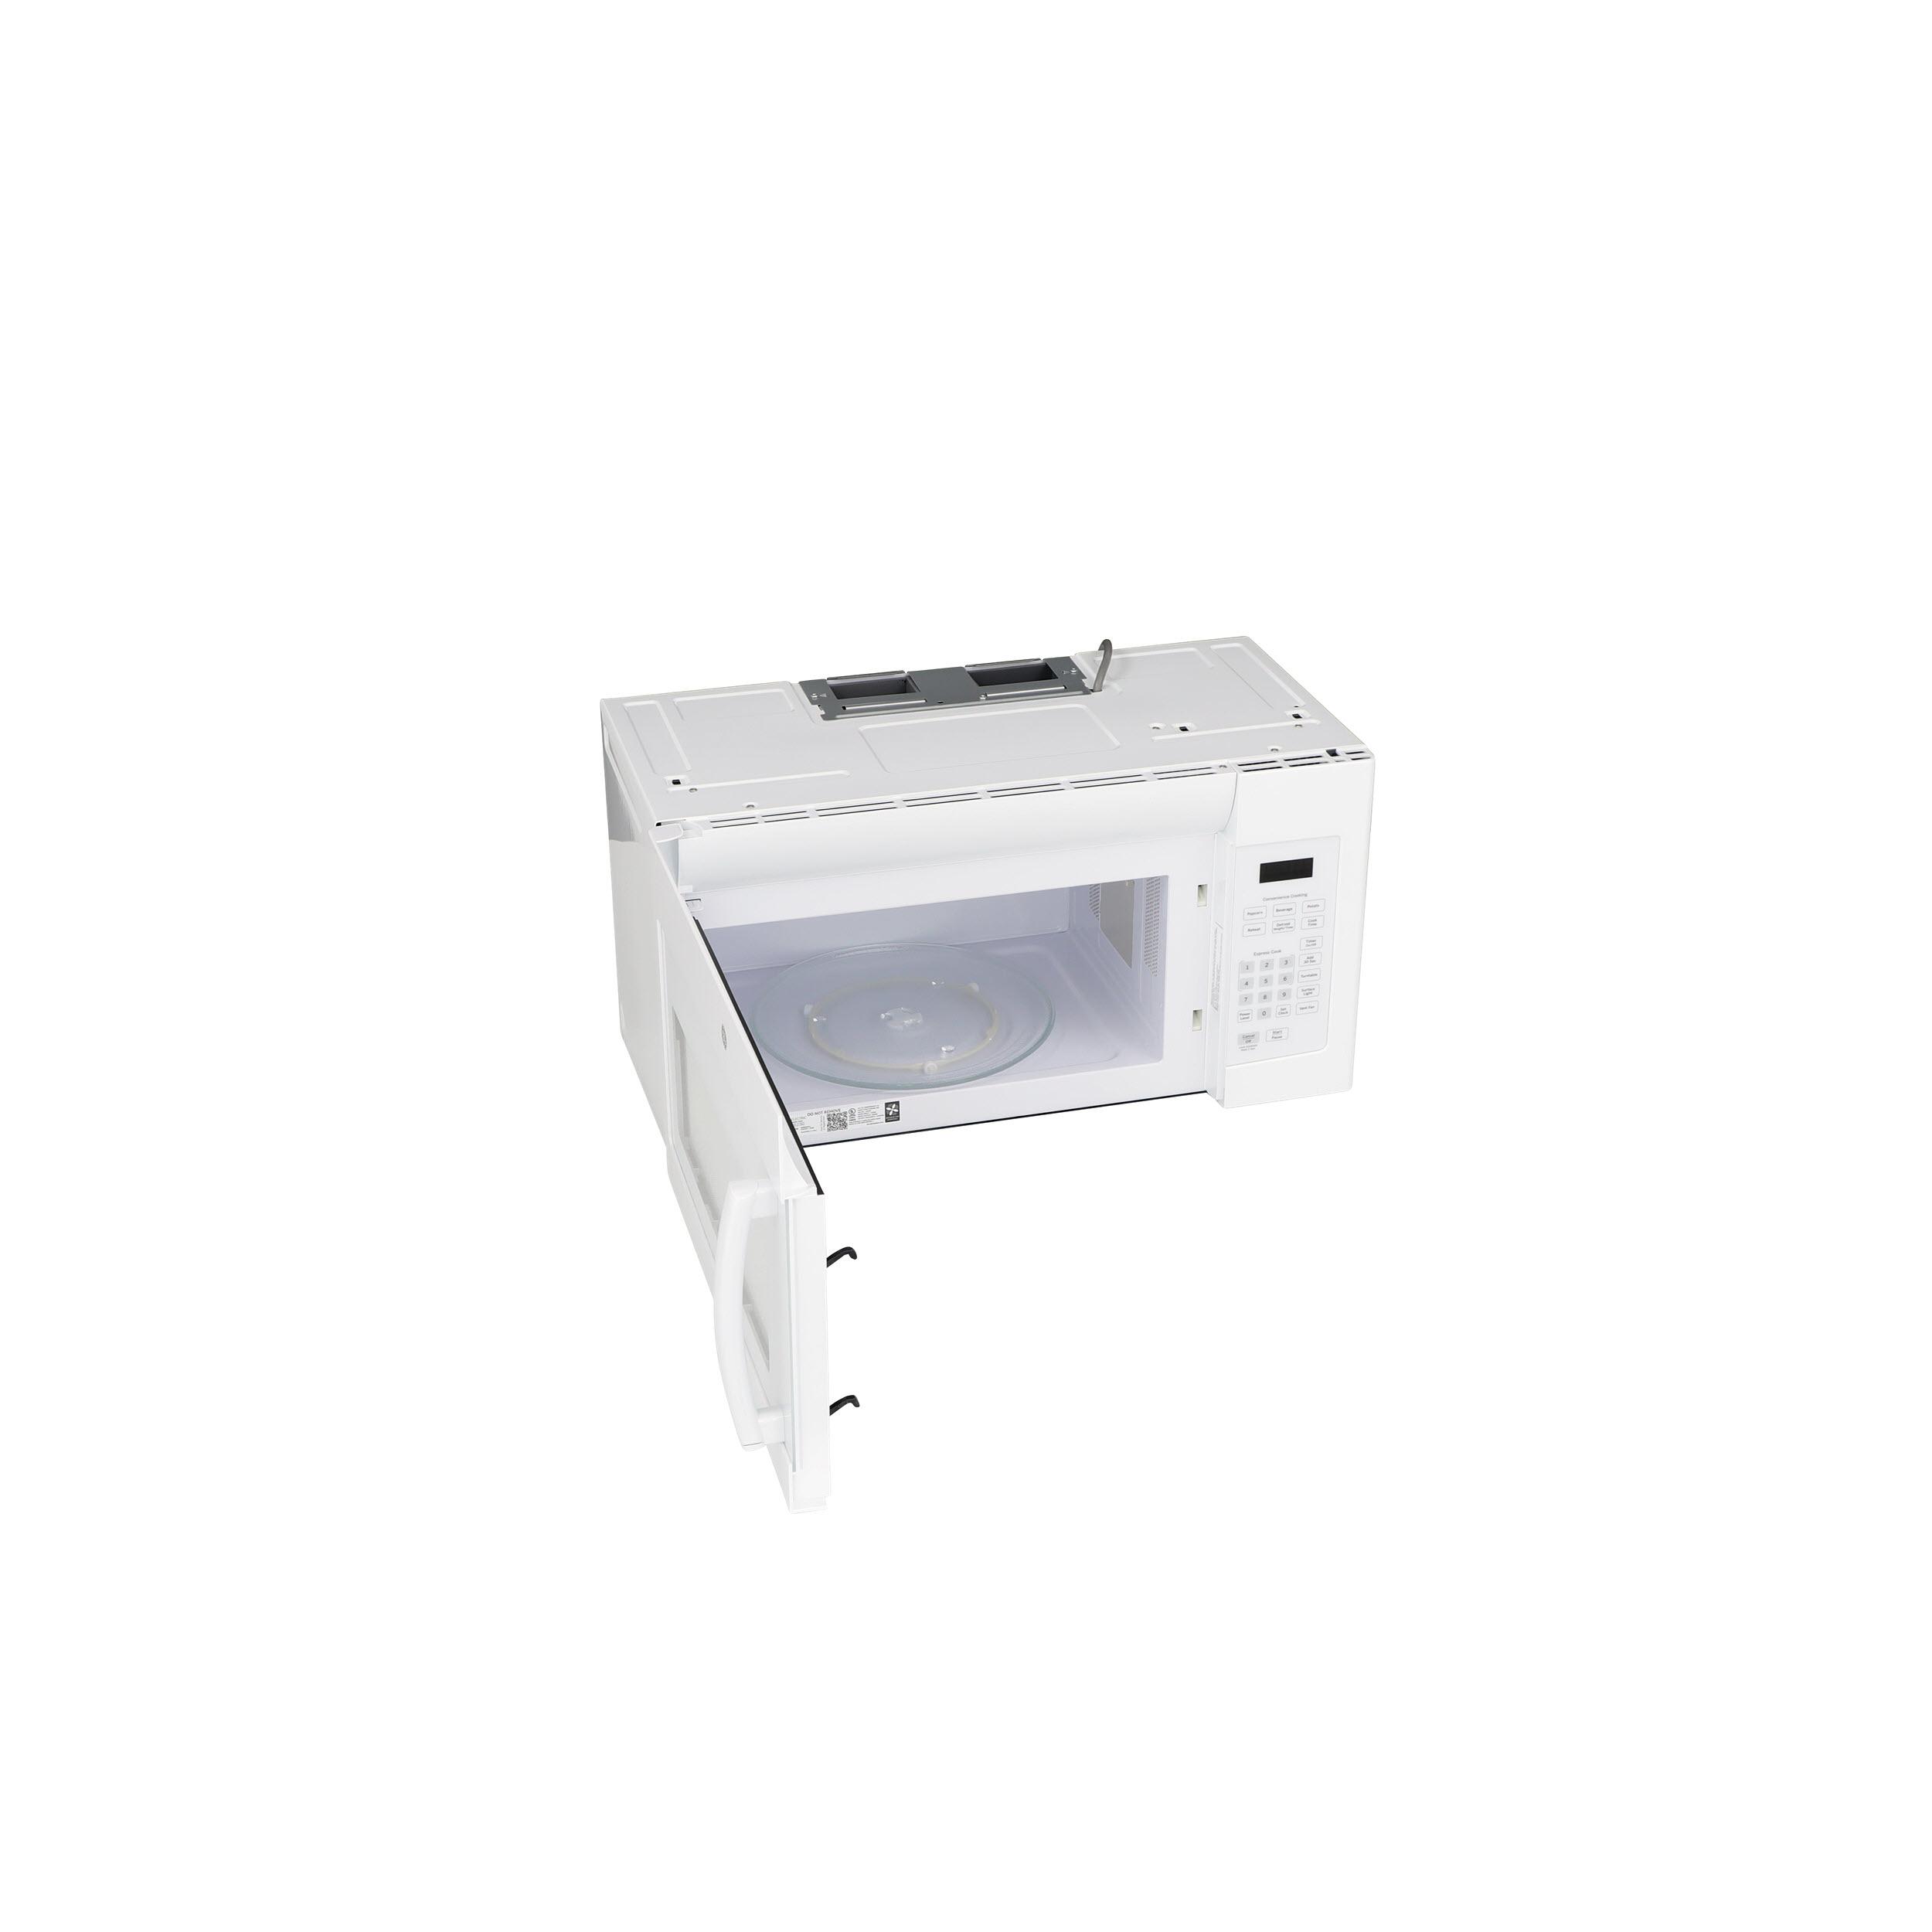 Model: JVM3160DFWW | GE GE® 1.6 Cu. Ft. Over-the-Range Microwave Oven